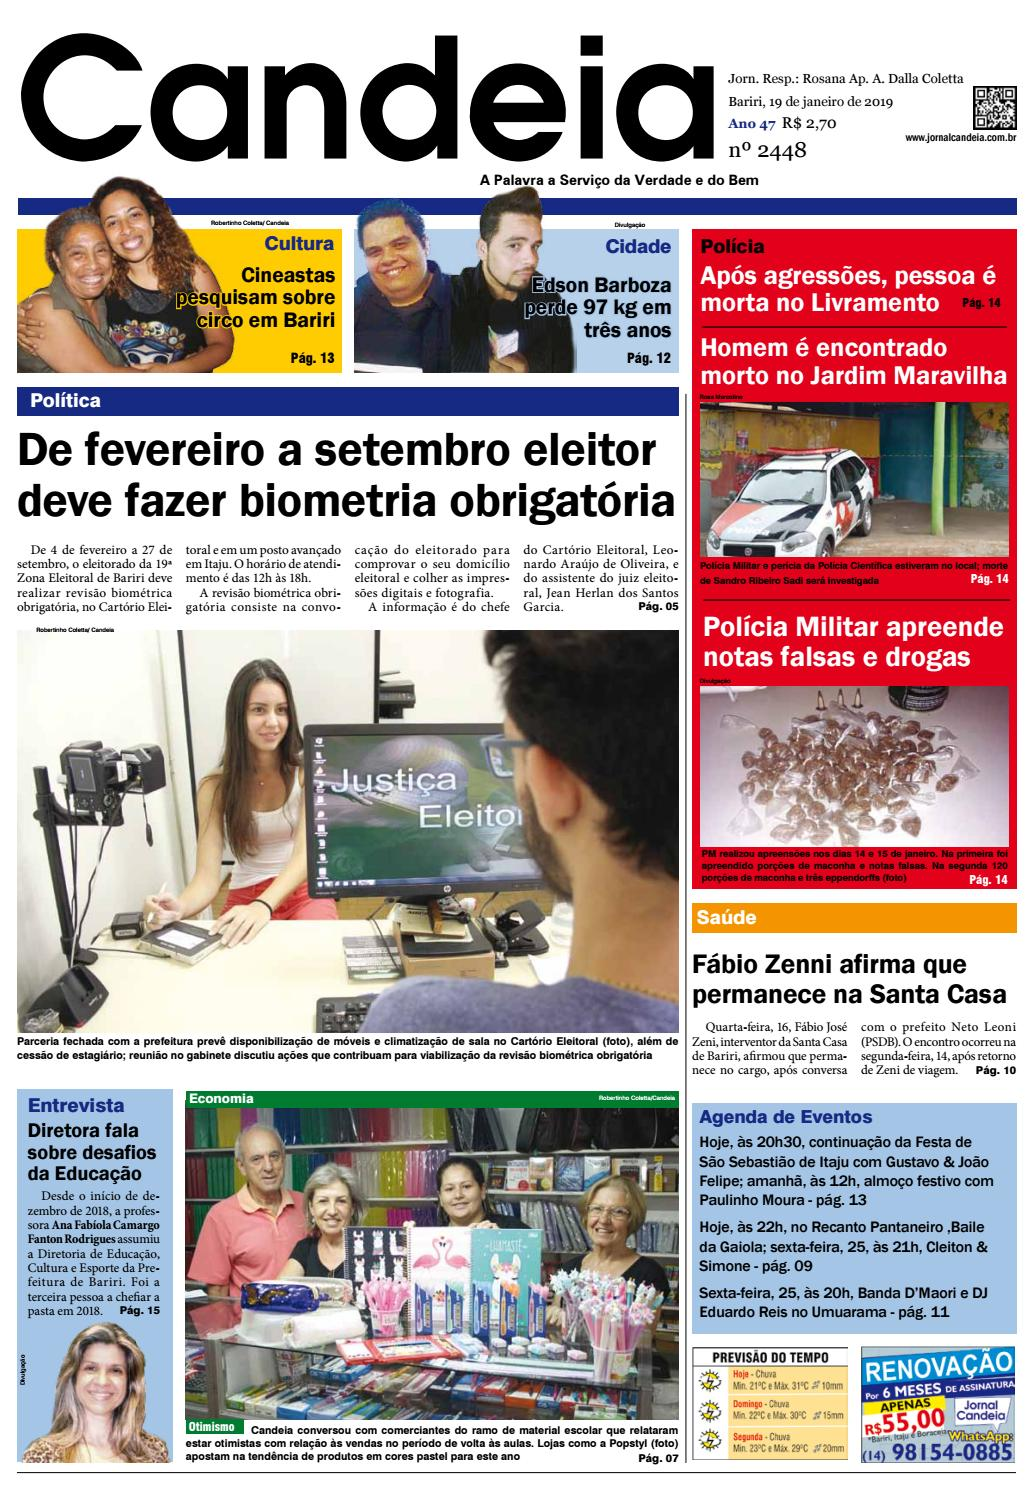 Jornal Candeia 19-01-2019 by Jornal Candeia - issuu a84cd70a04d